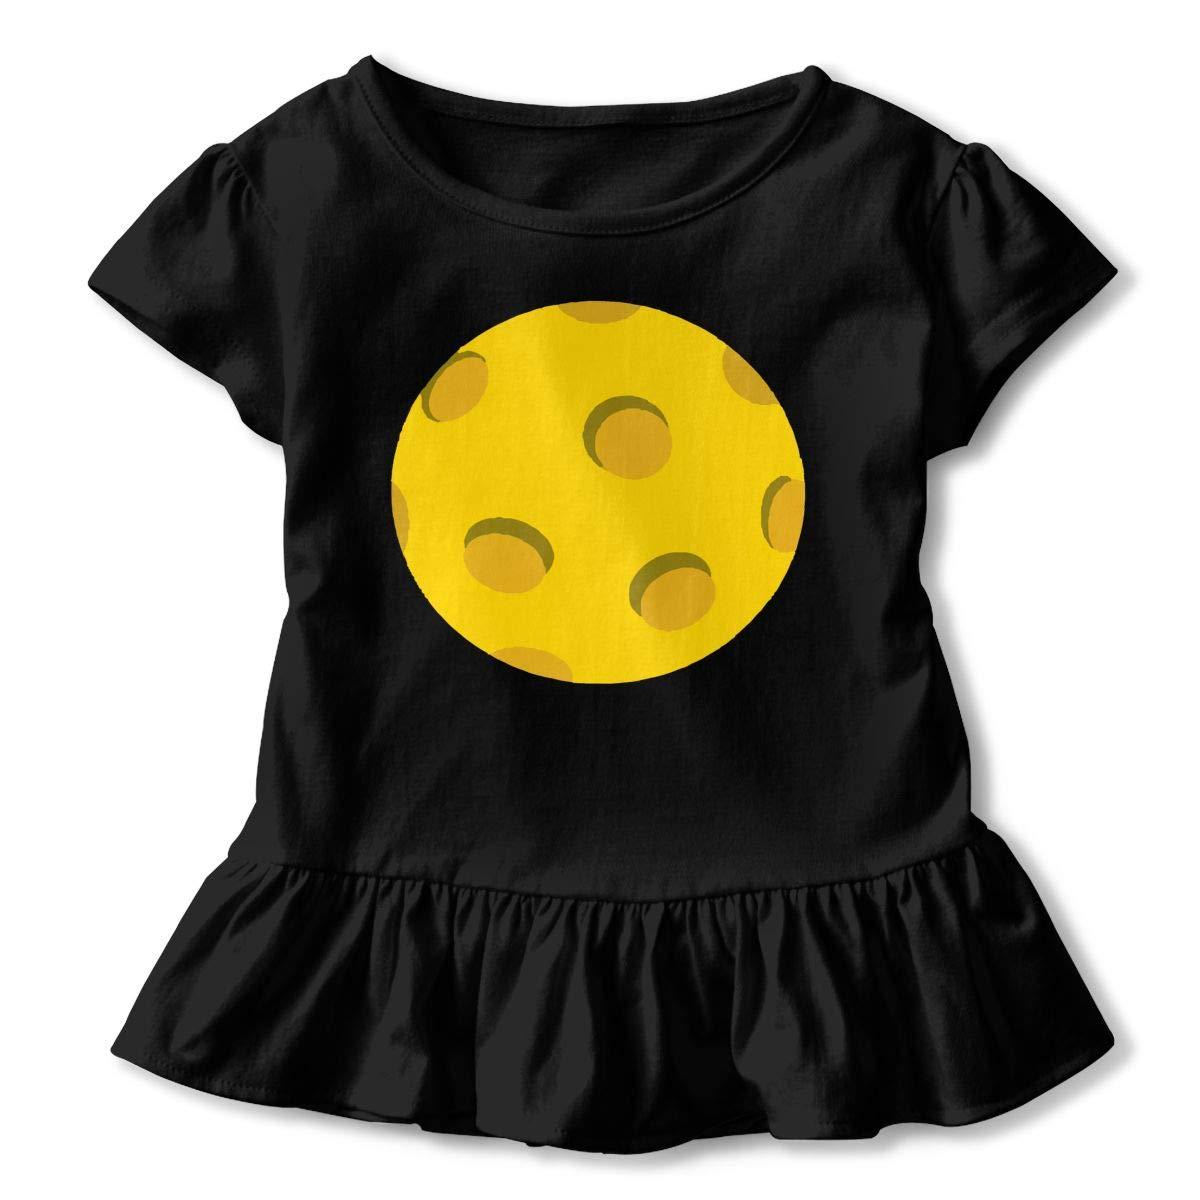 2-Pack Cotton Tee Pickleball Baby Girls Short Sleeve Ruffles T-Shirt Tops